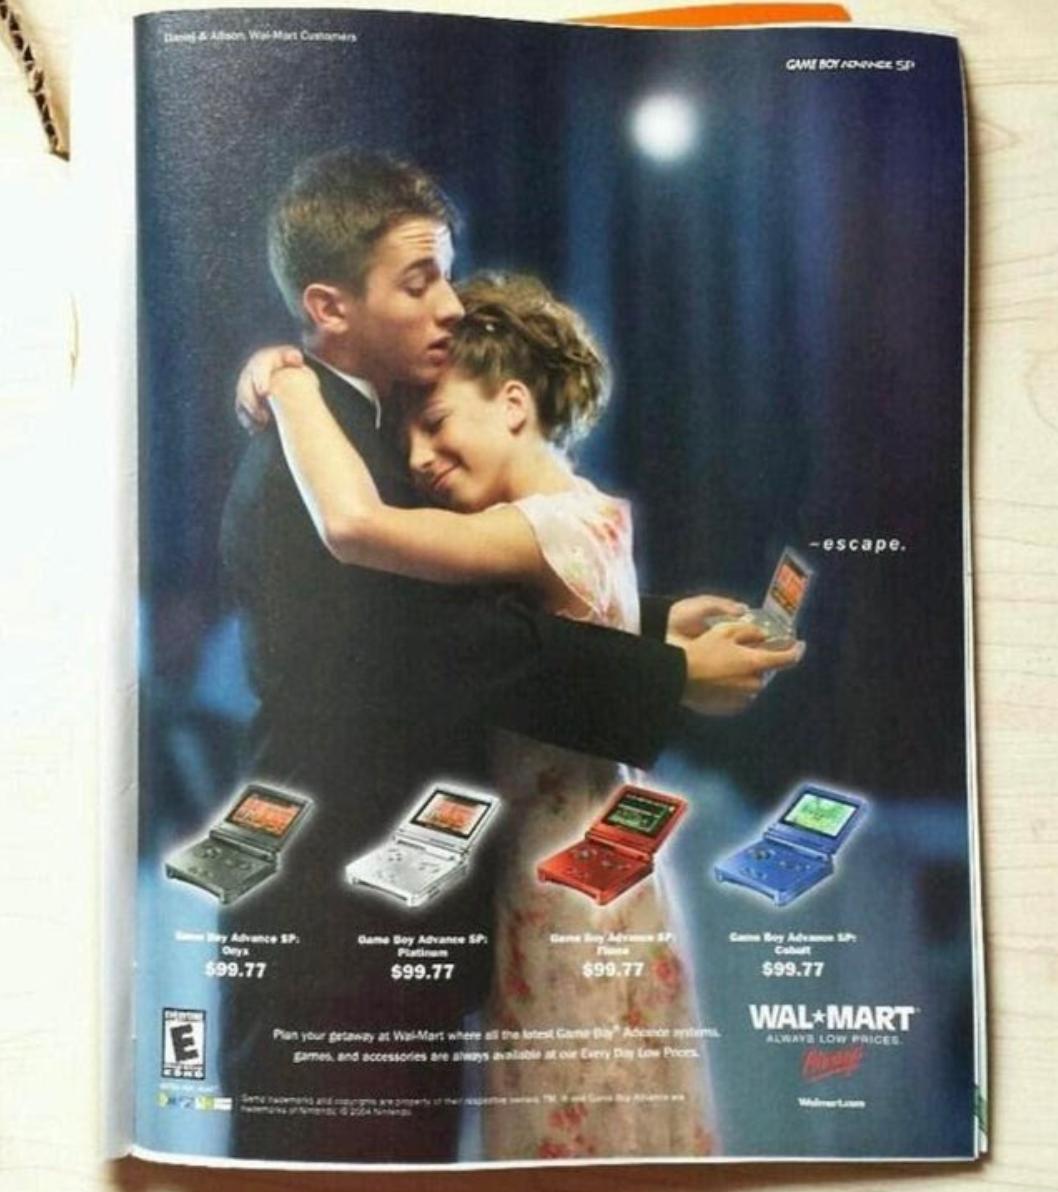 A vintage Walmart/Game Boy ad